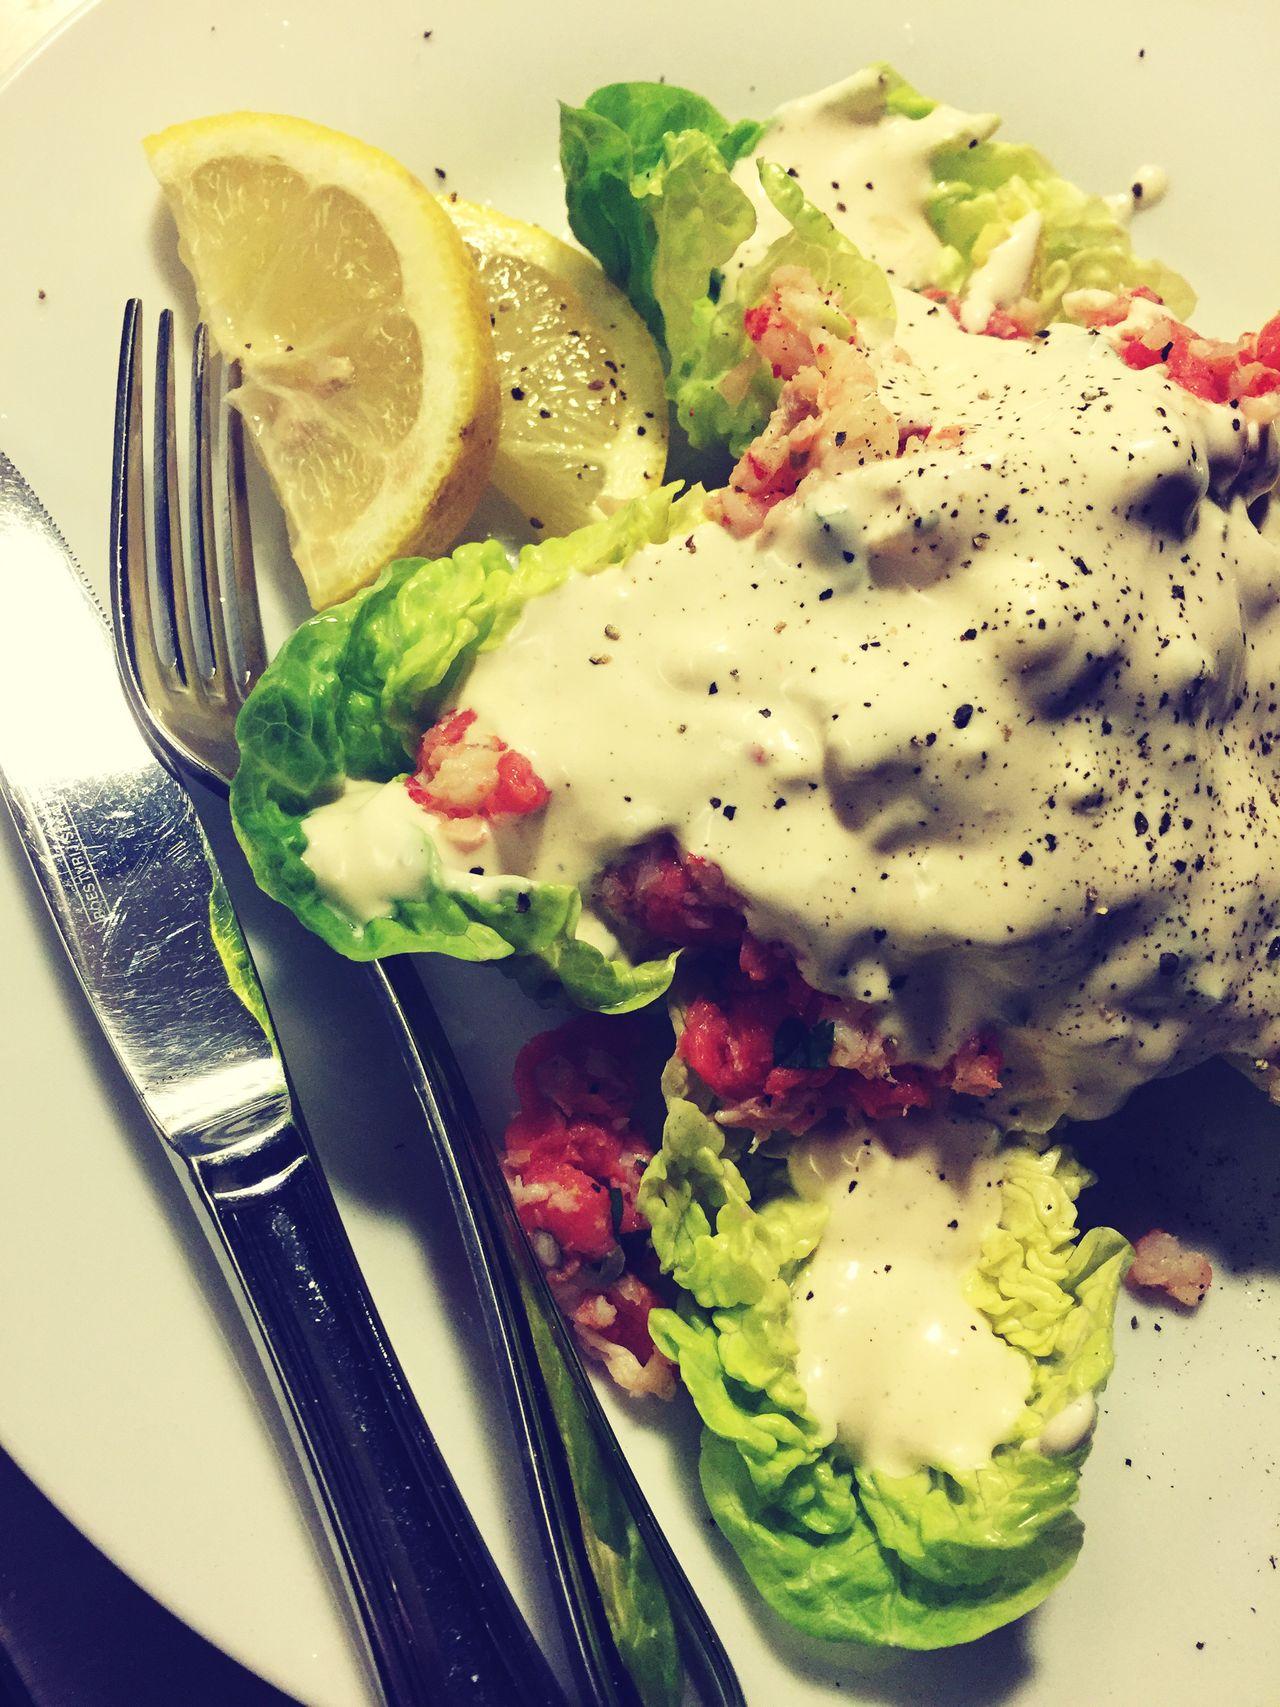 River Lobster Salad At Home 😋